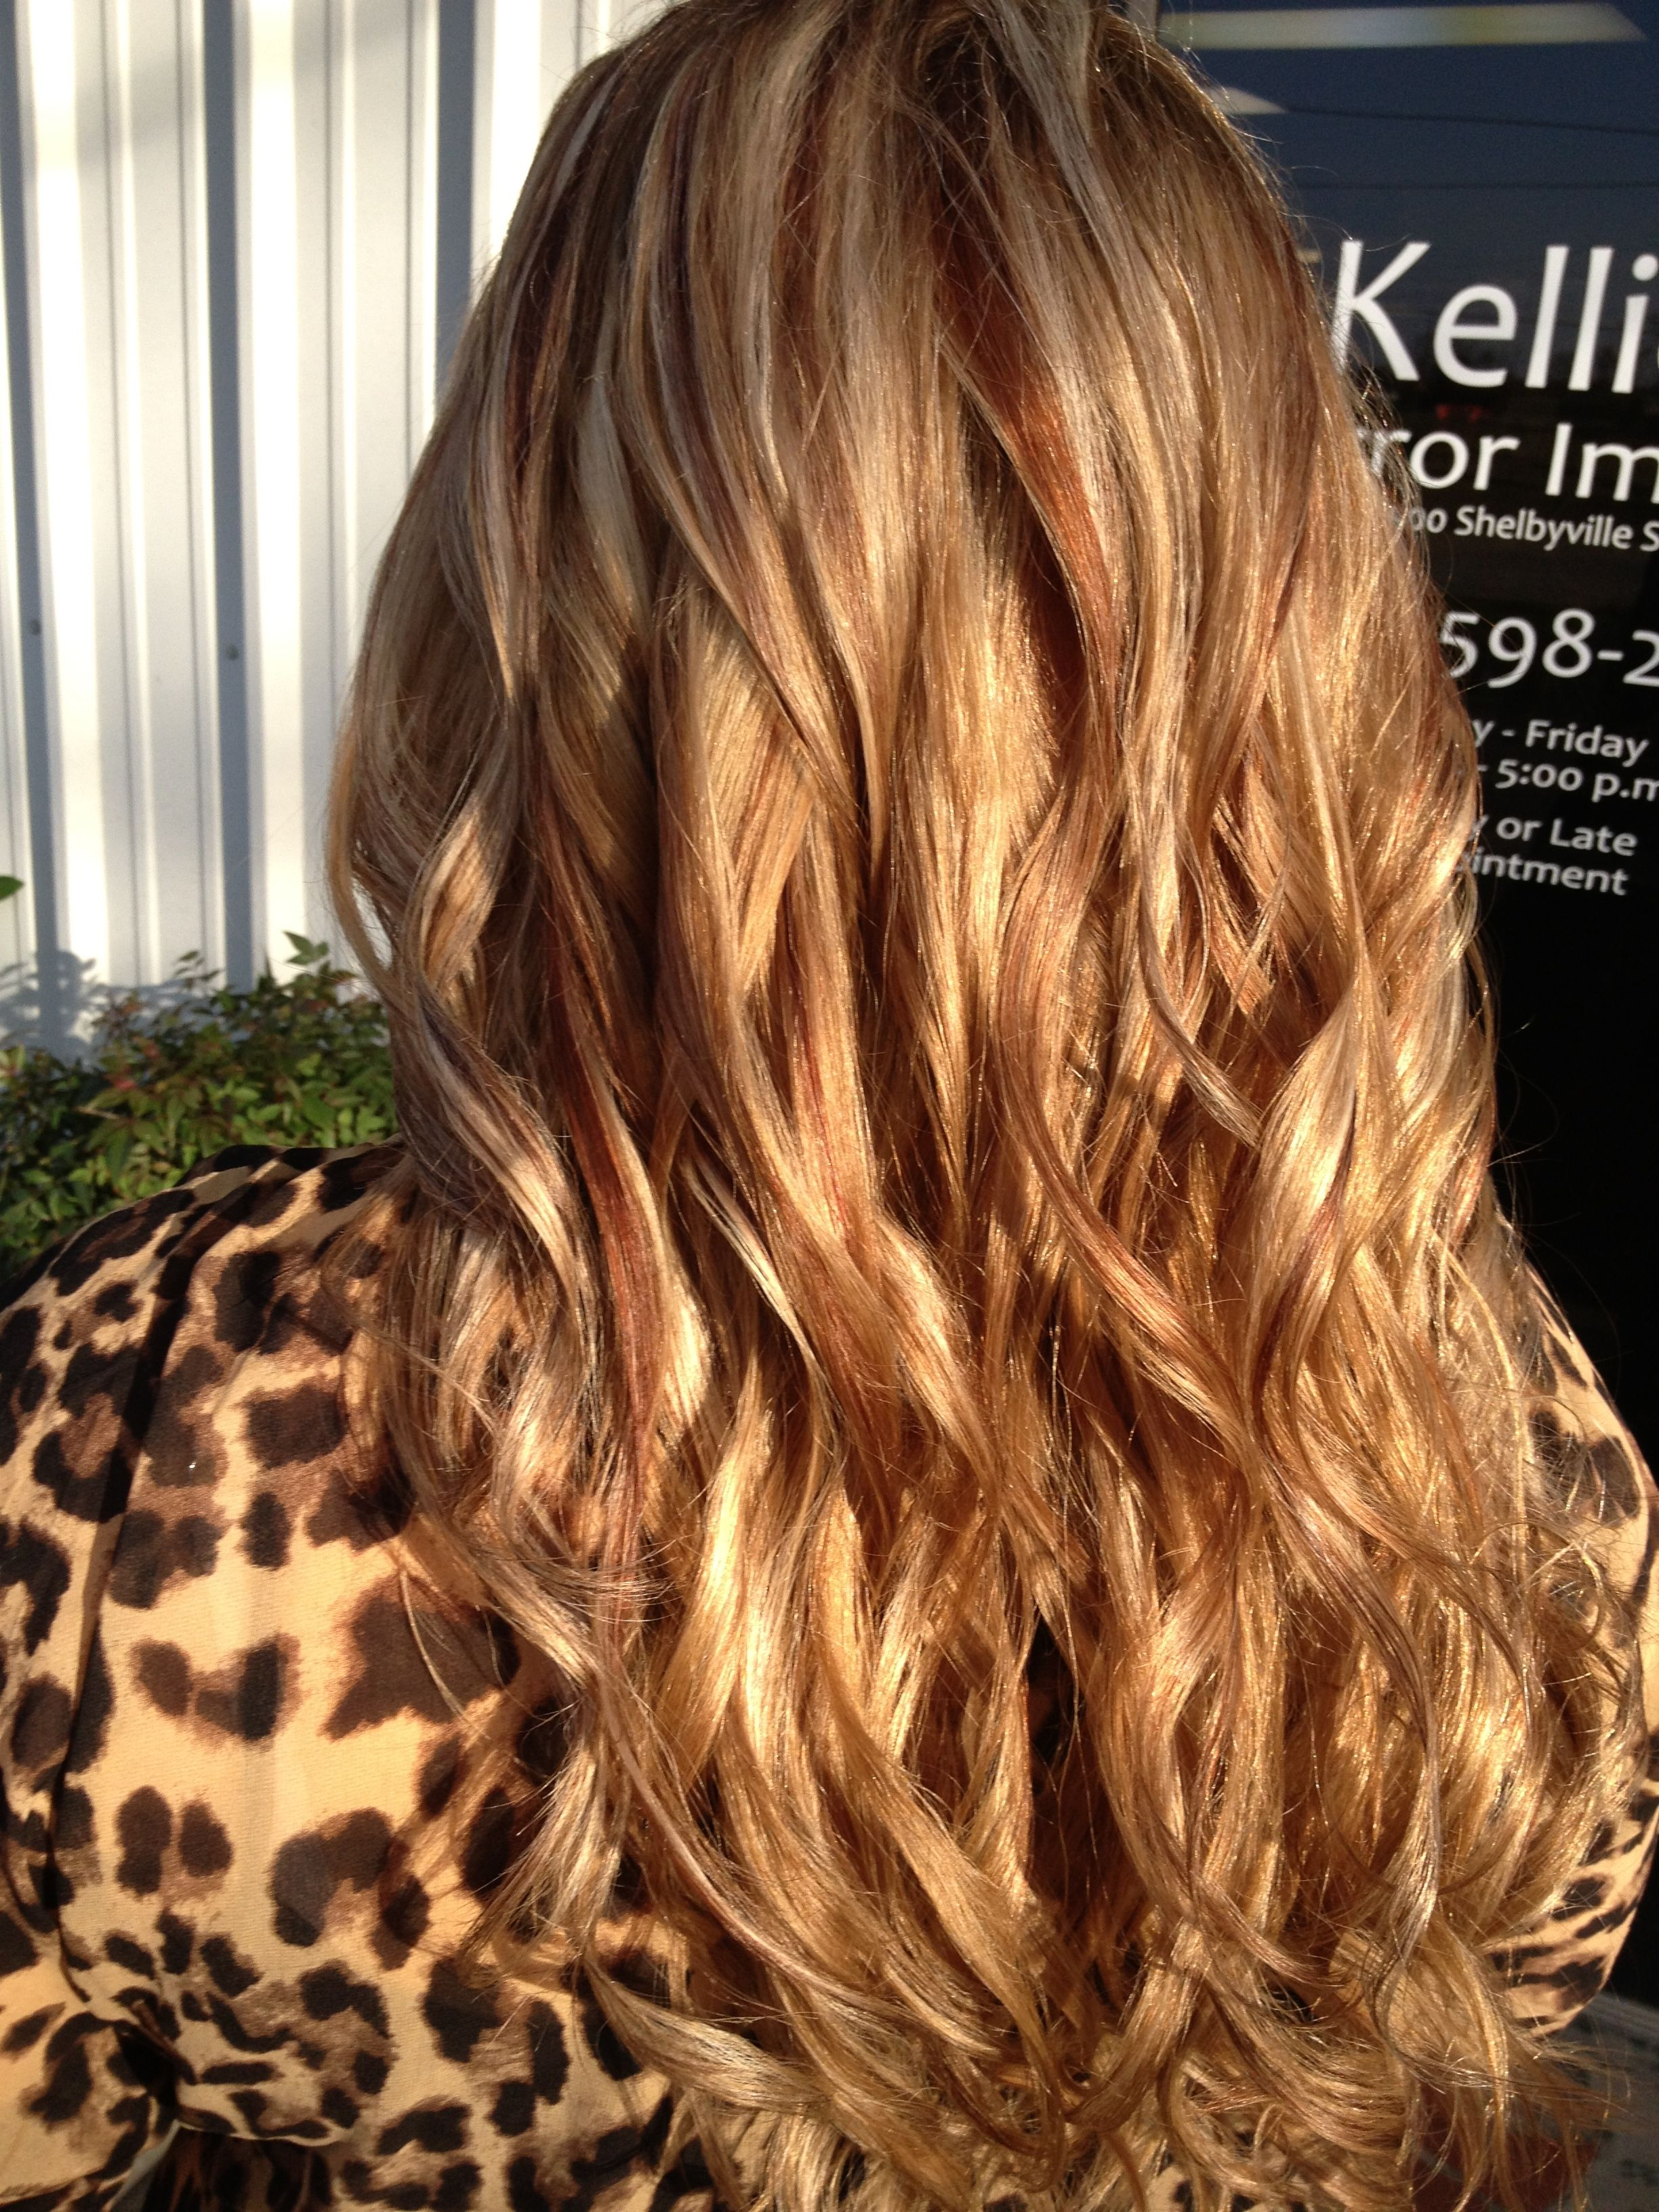 Hair color blonde red brown medium brown highlights lowlights